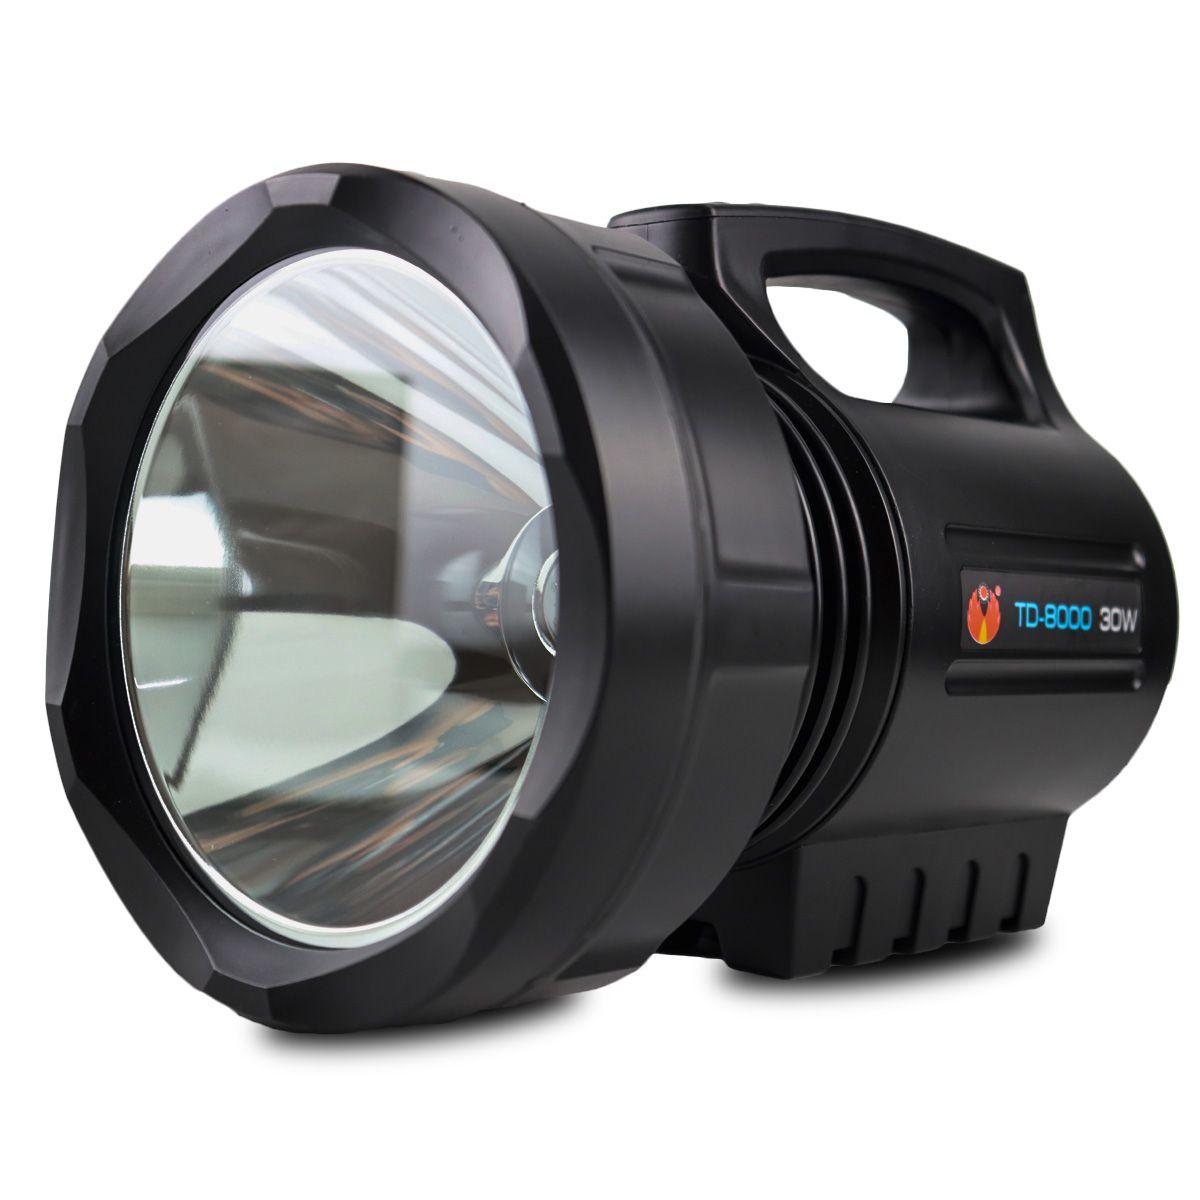 Lanterna Led Holofote Recarregável TD-8000